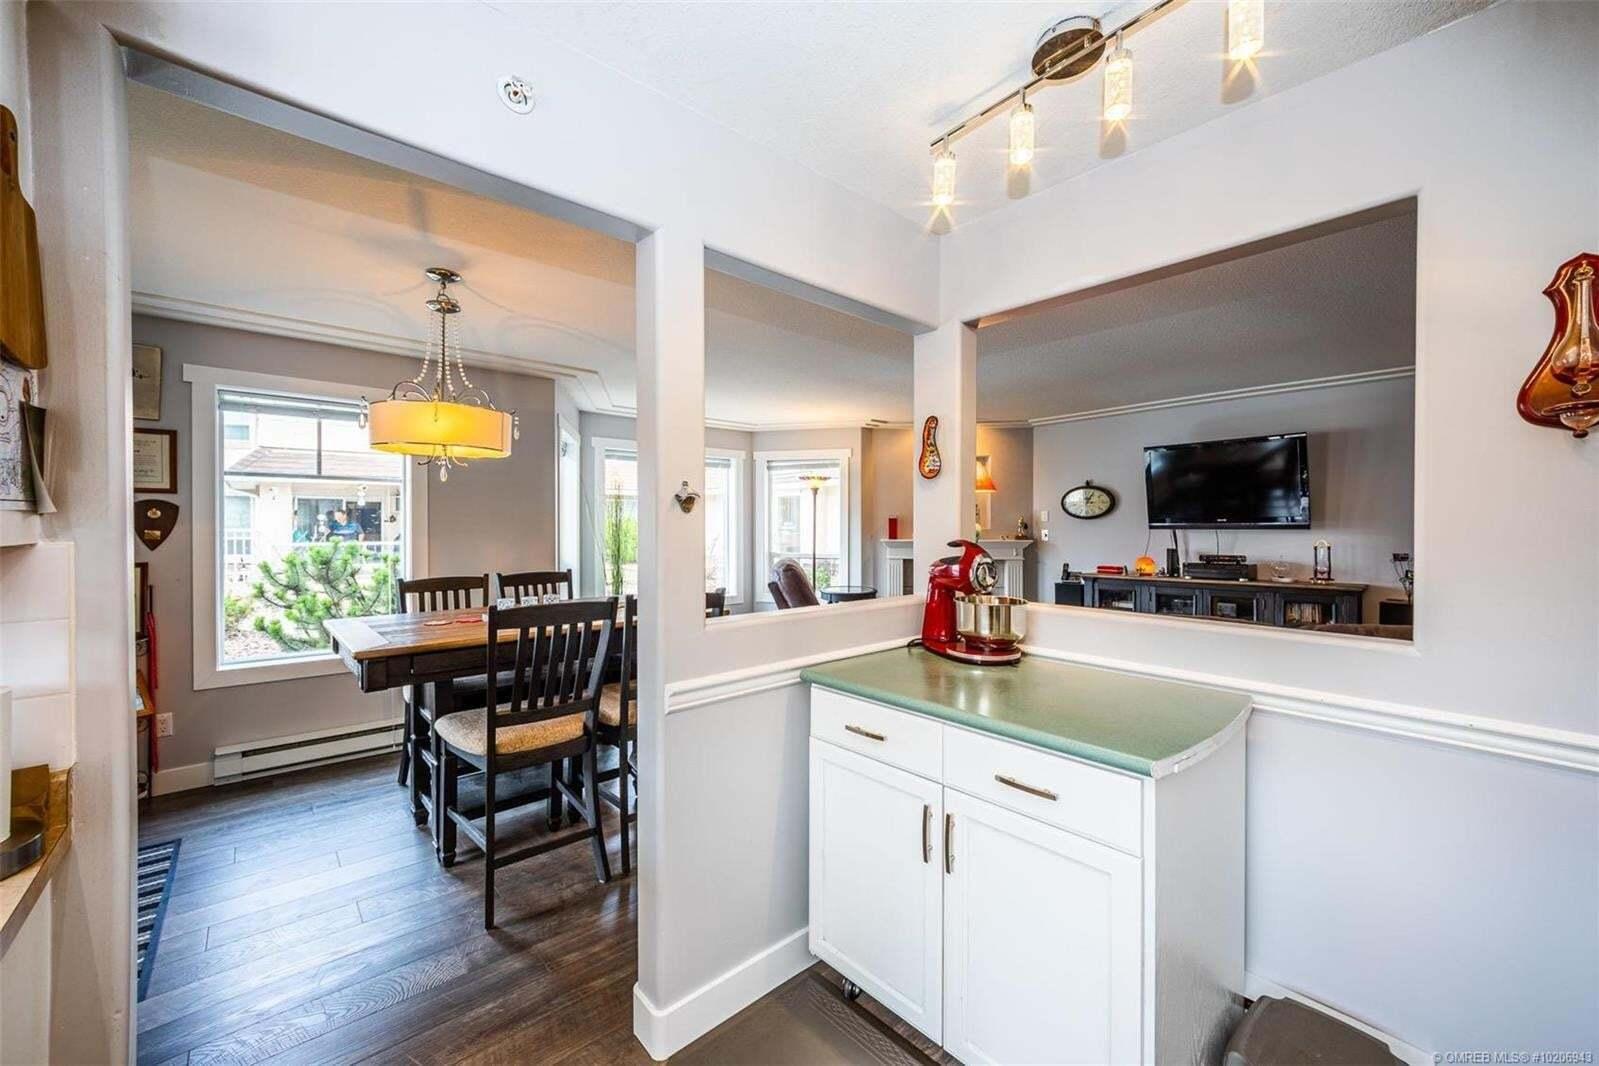 Condo for sale at 315 Whitman Rd Kelowna British Columbia - MLS: 10206943